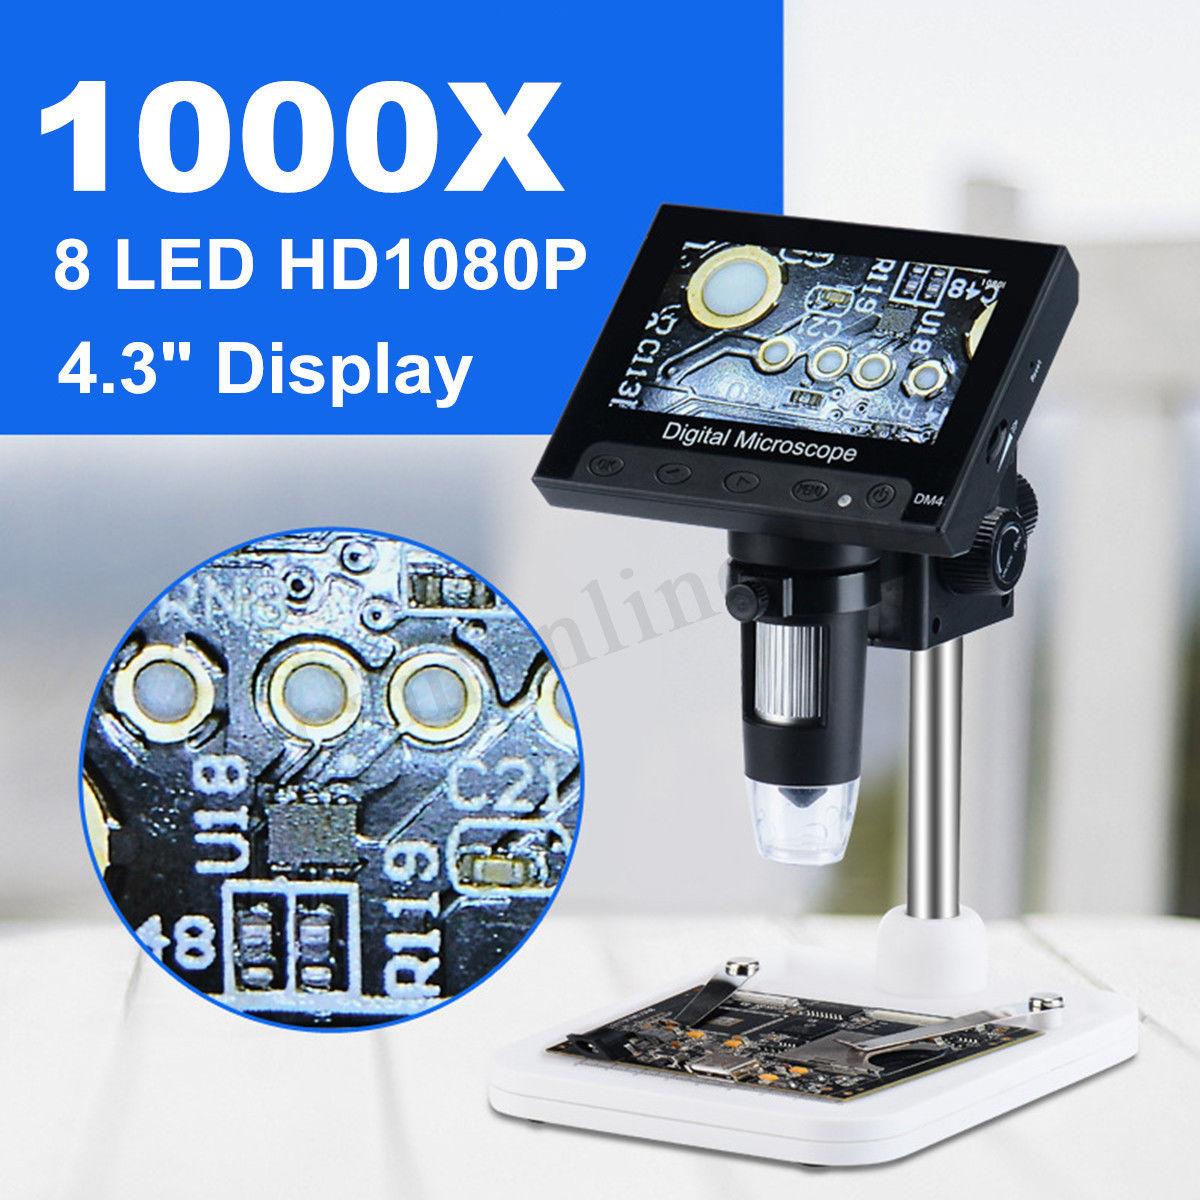 1000x2,0 Мп USB цифровой электронный микроскоп DM4 4,3 ЖК дисплей Дисплей VGA микроскоп с 8 светодиодный подставка для материнская плата (PCB), ремонт